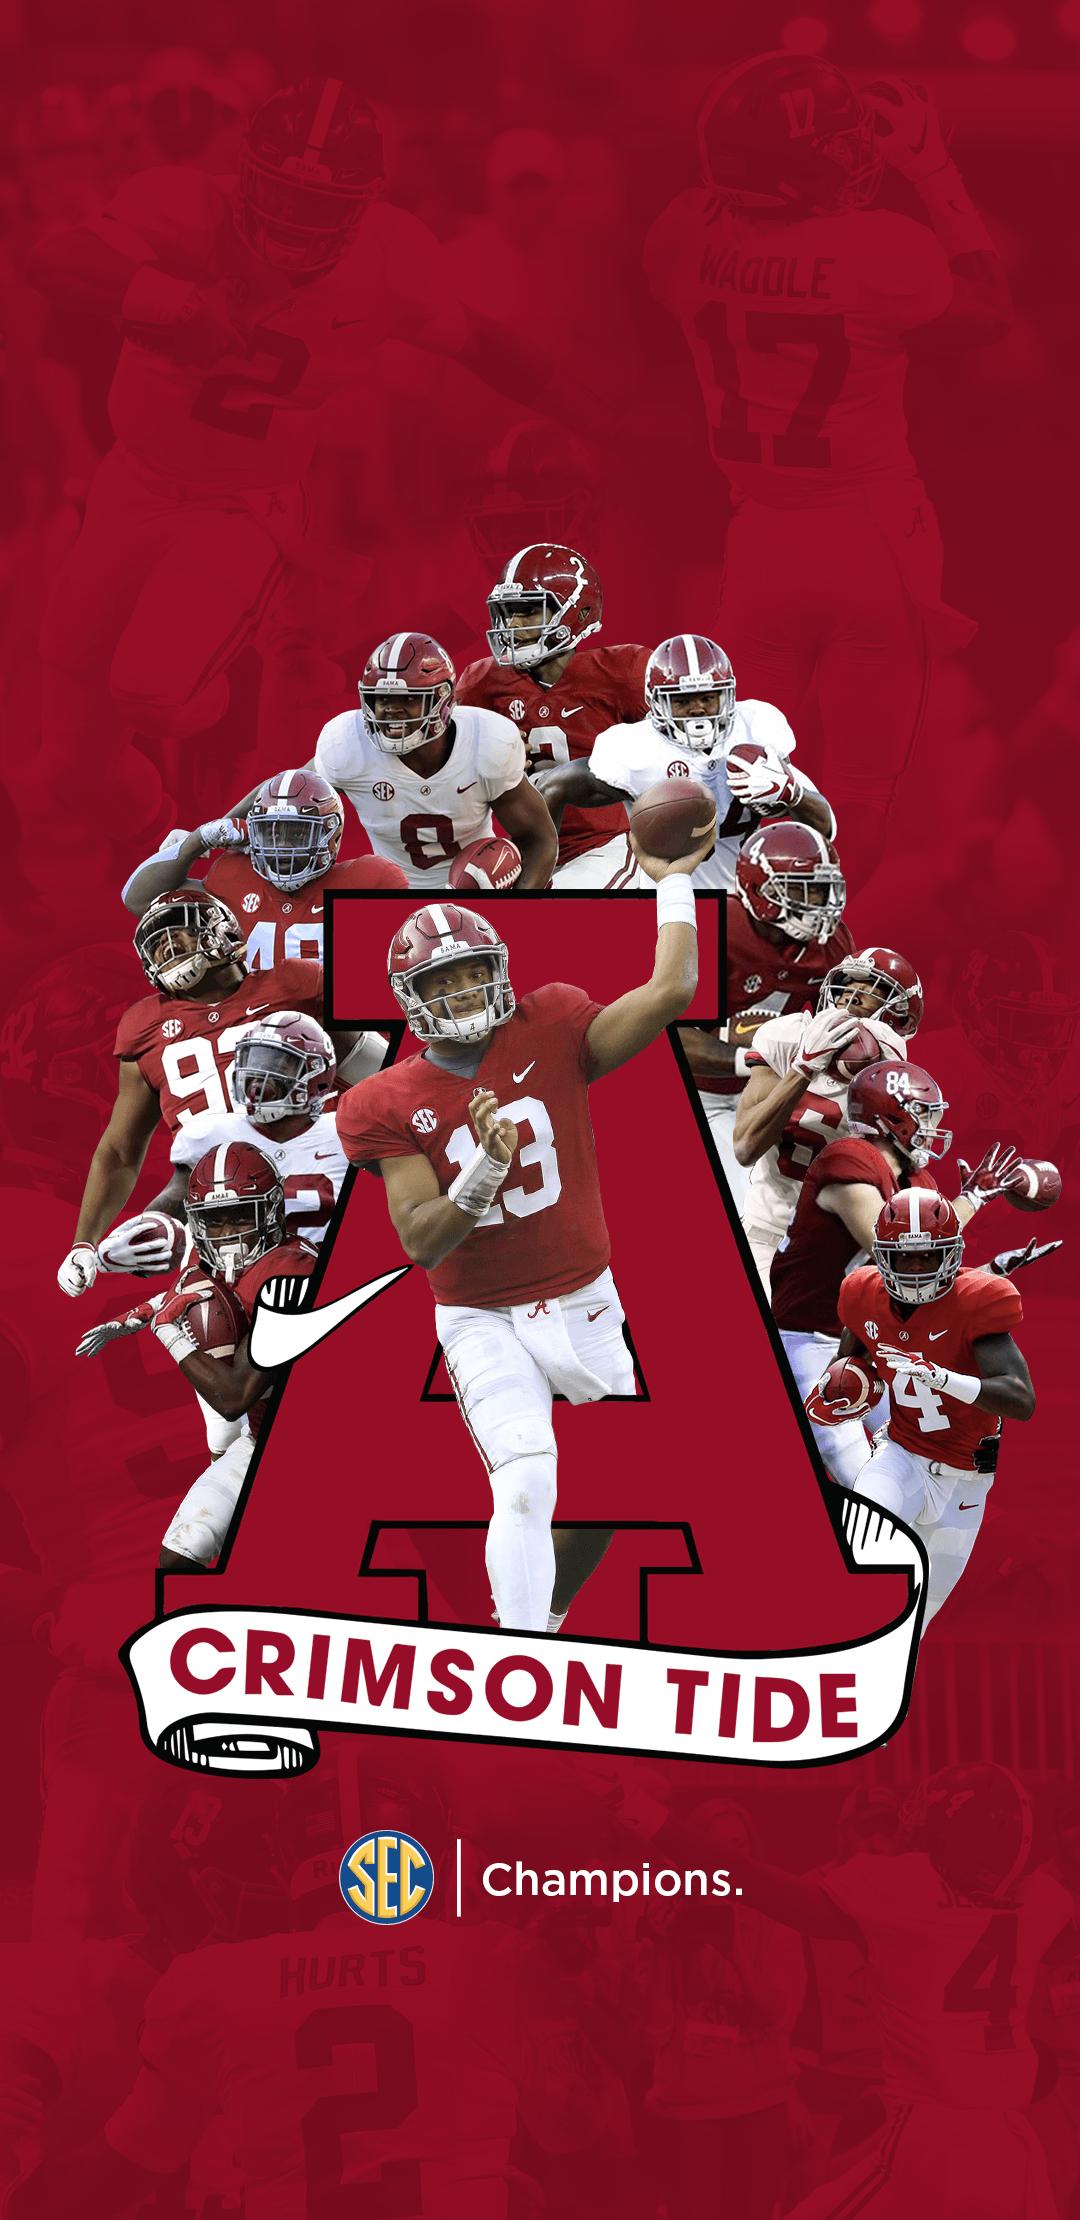 SEC Championship 2019 Wallpapers